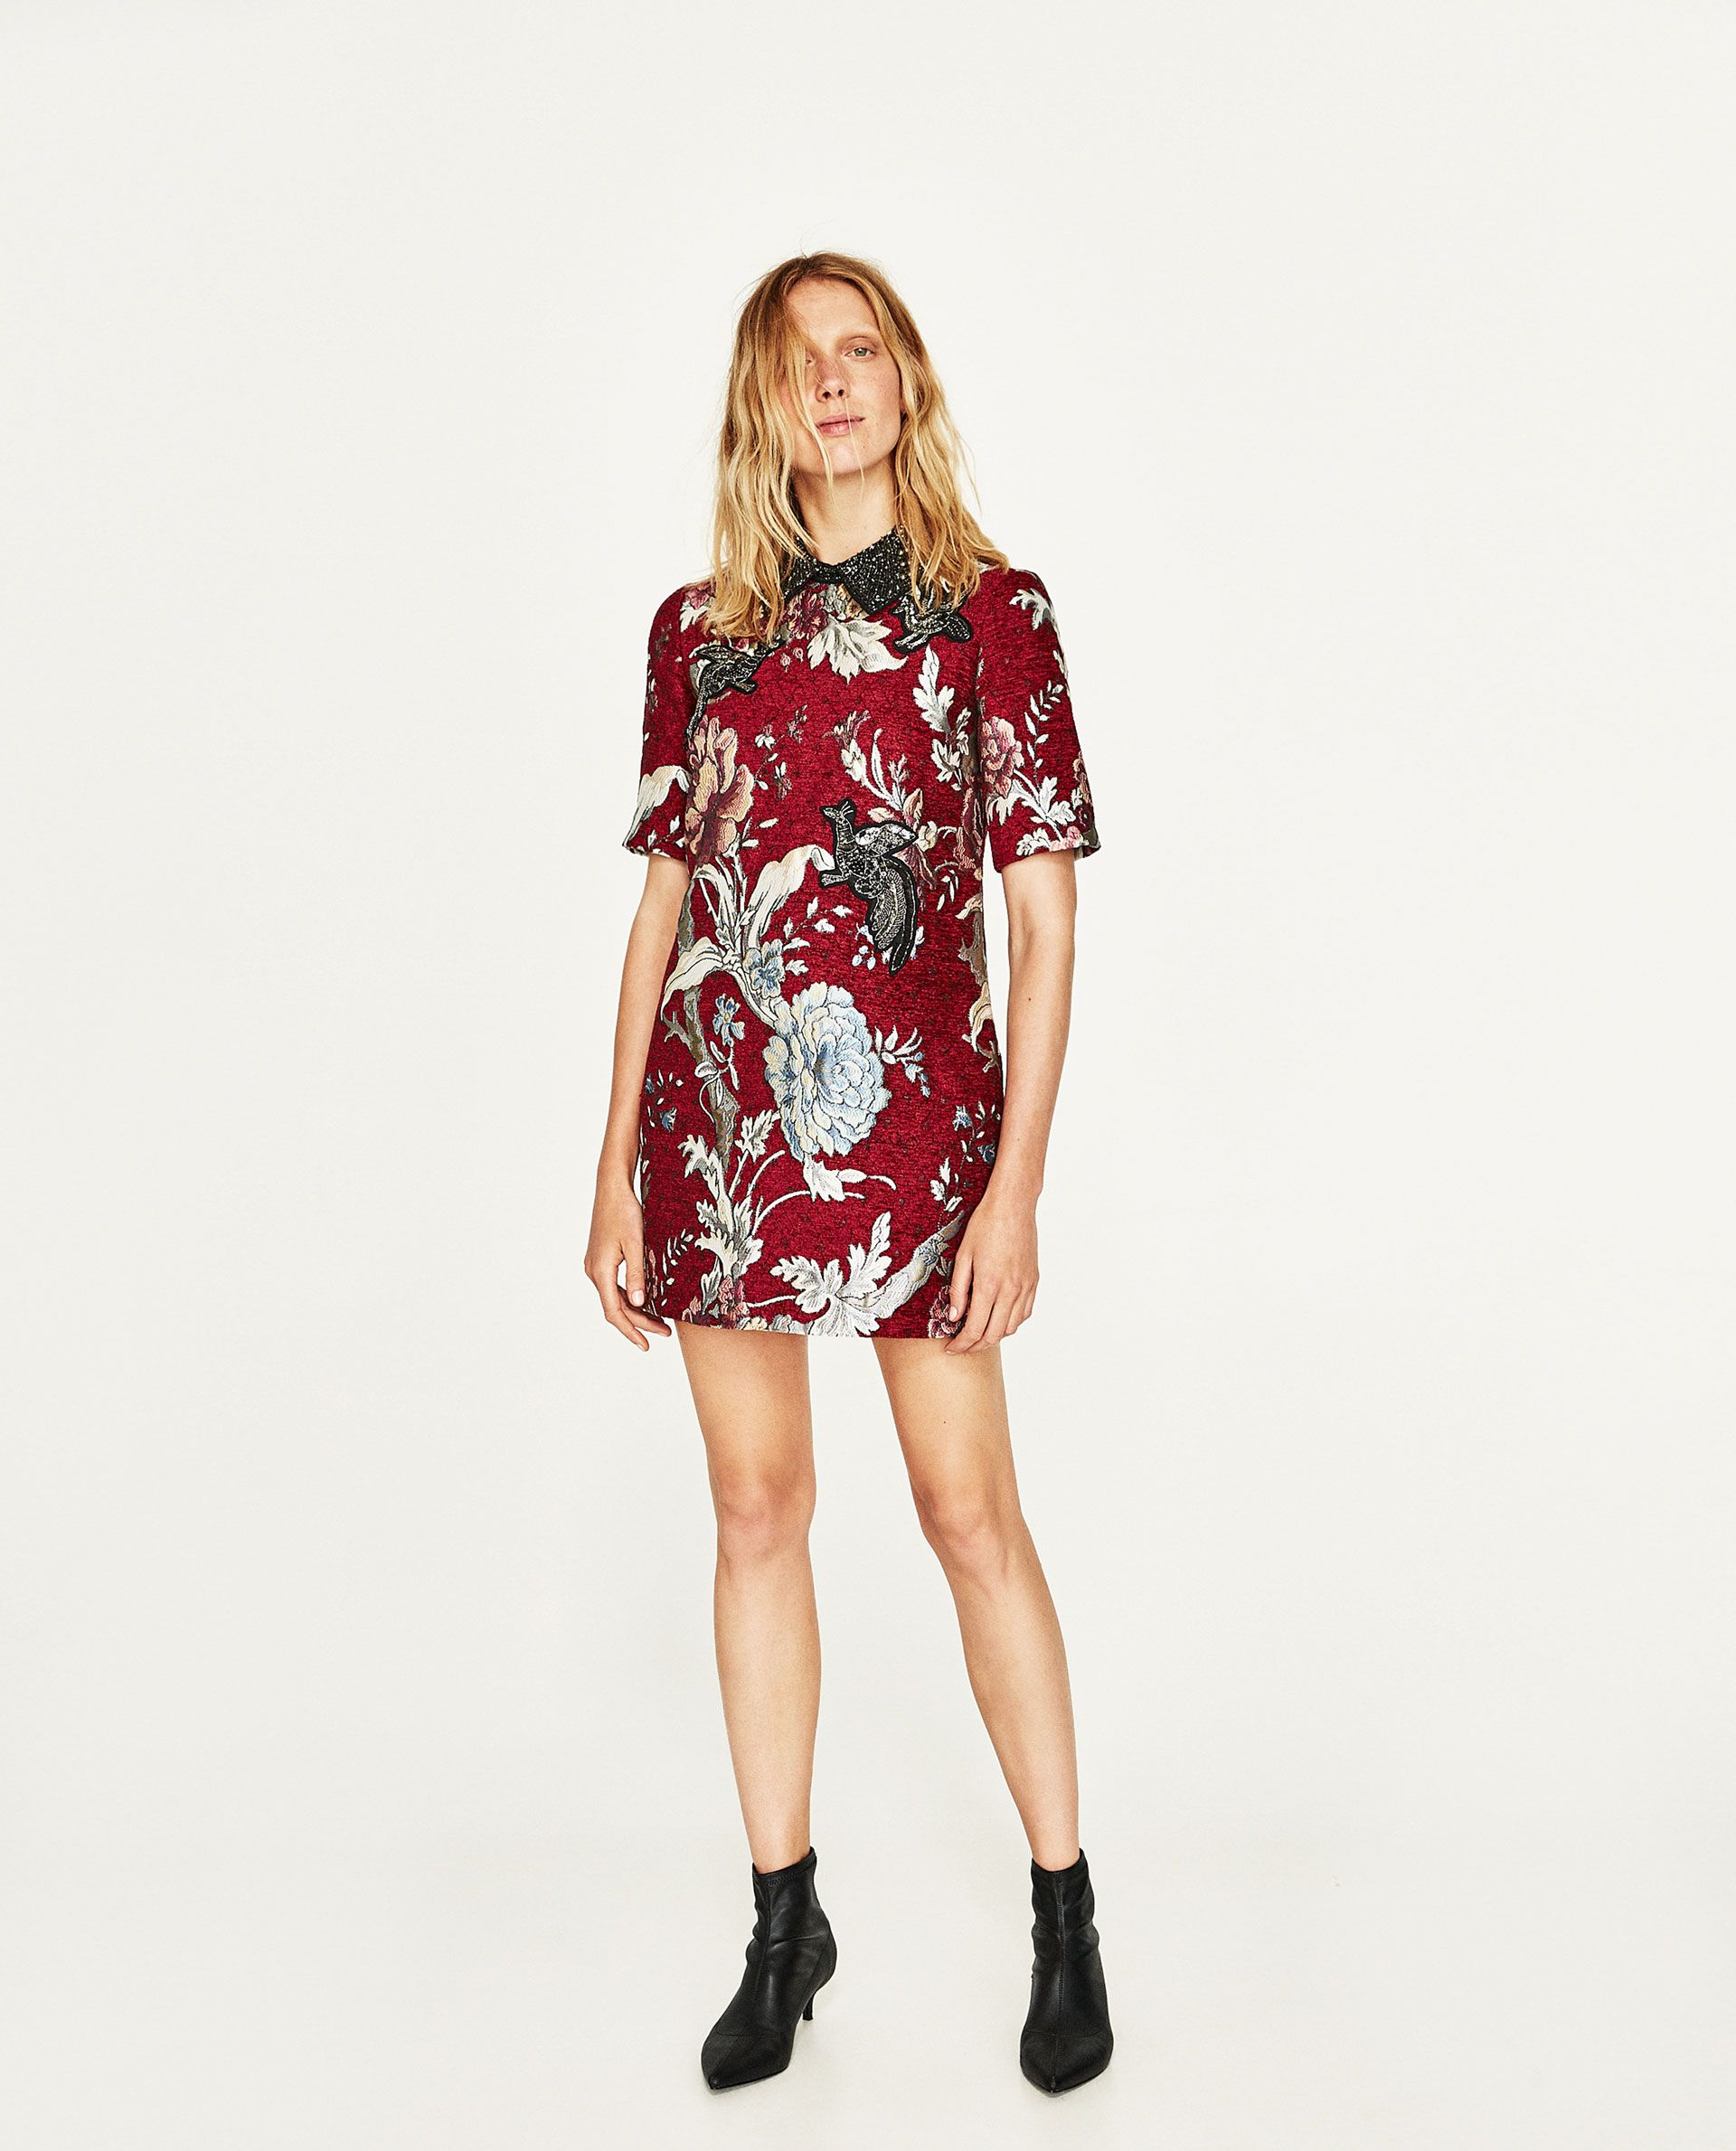 8aae45c4dc49 VESTIDO JACQUARD PARCHES | ZARA FC | Dresses, Jacquard dress e Cheap ...